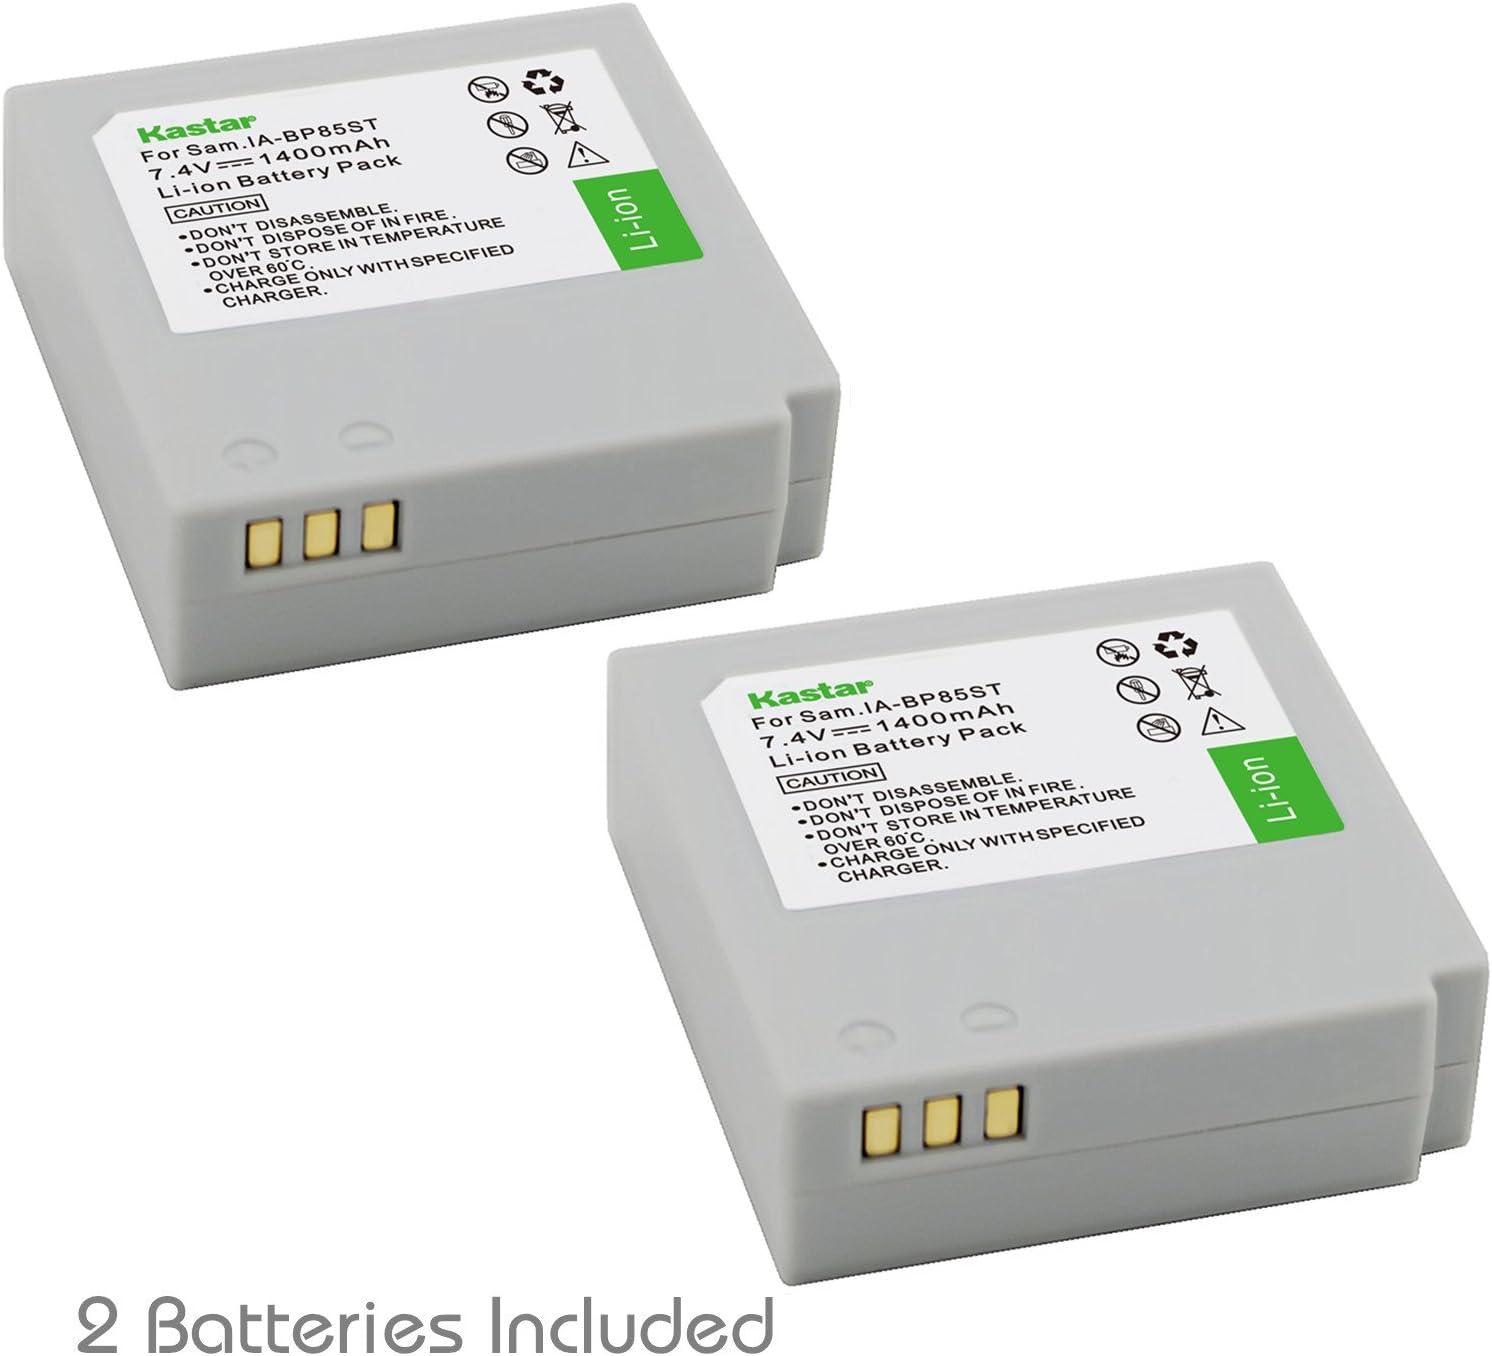 SAMSUNG IA BP85ST Battery, Discount IA